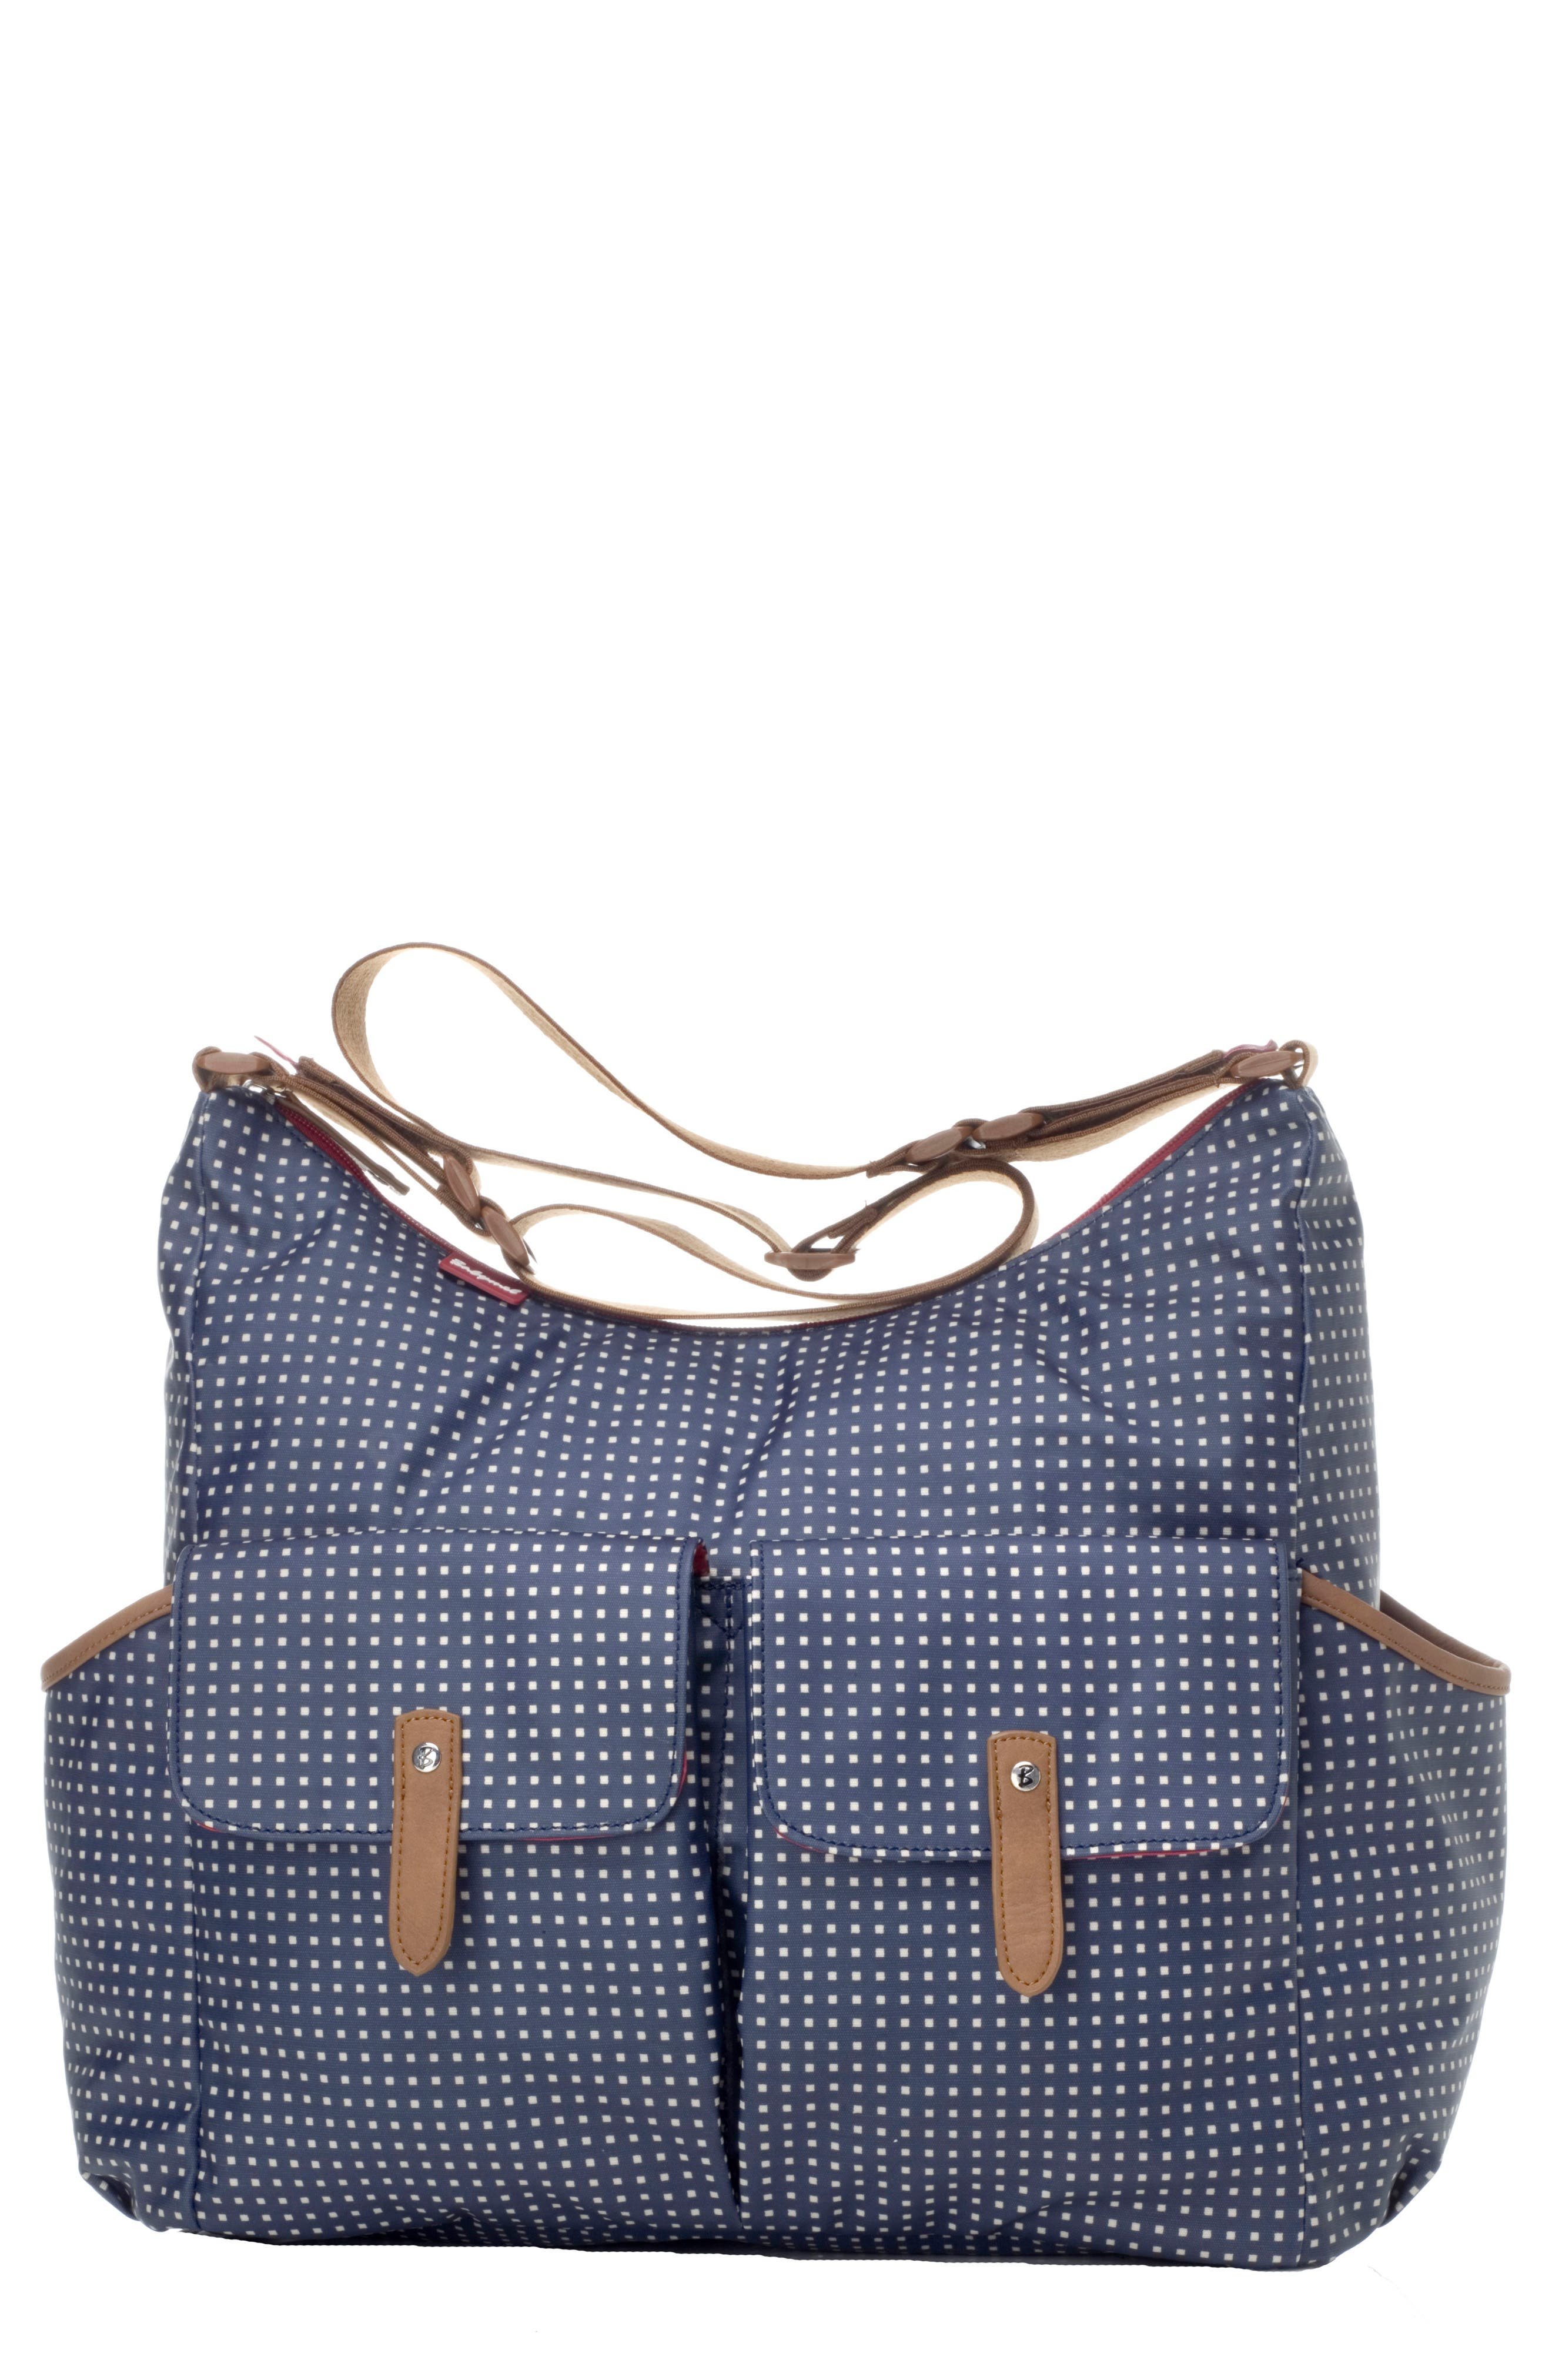 Frankie Diaper Bag,                             Main thumbnail 1, color,                             Pixel Dot Navy